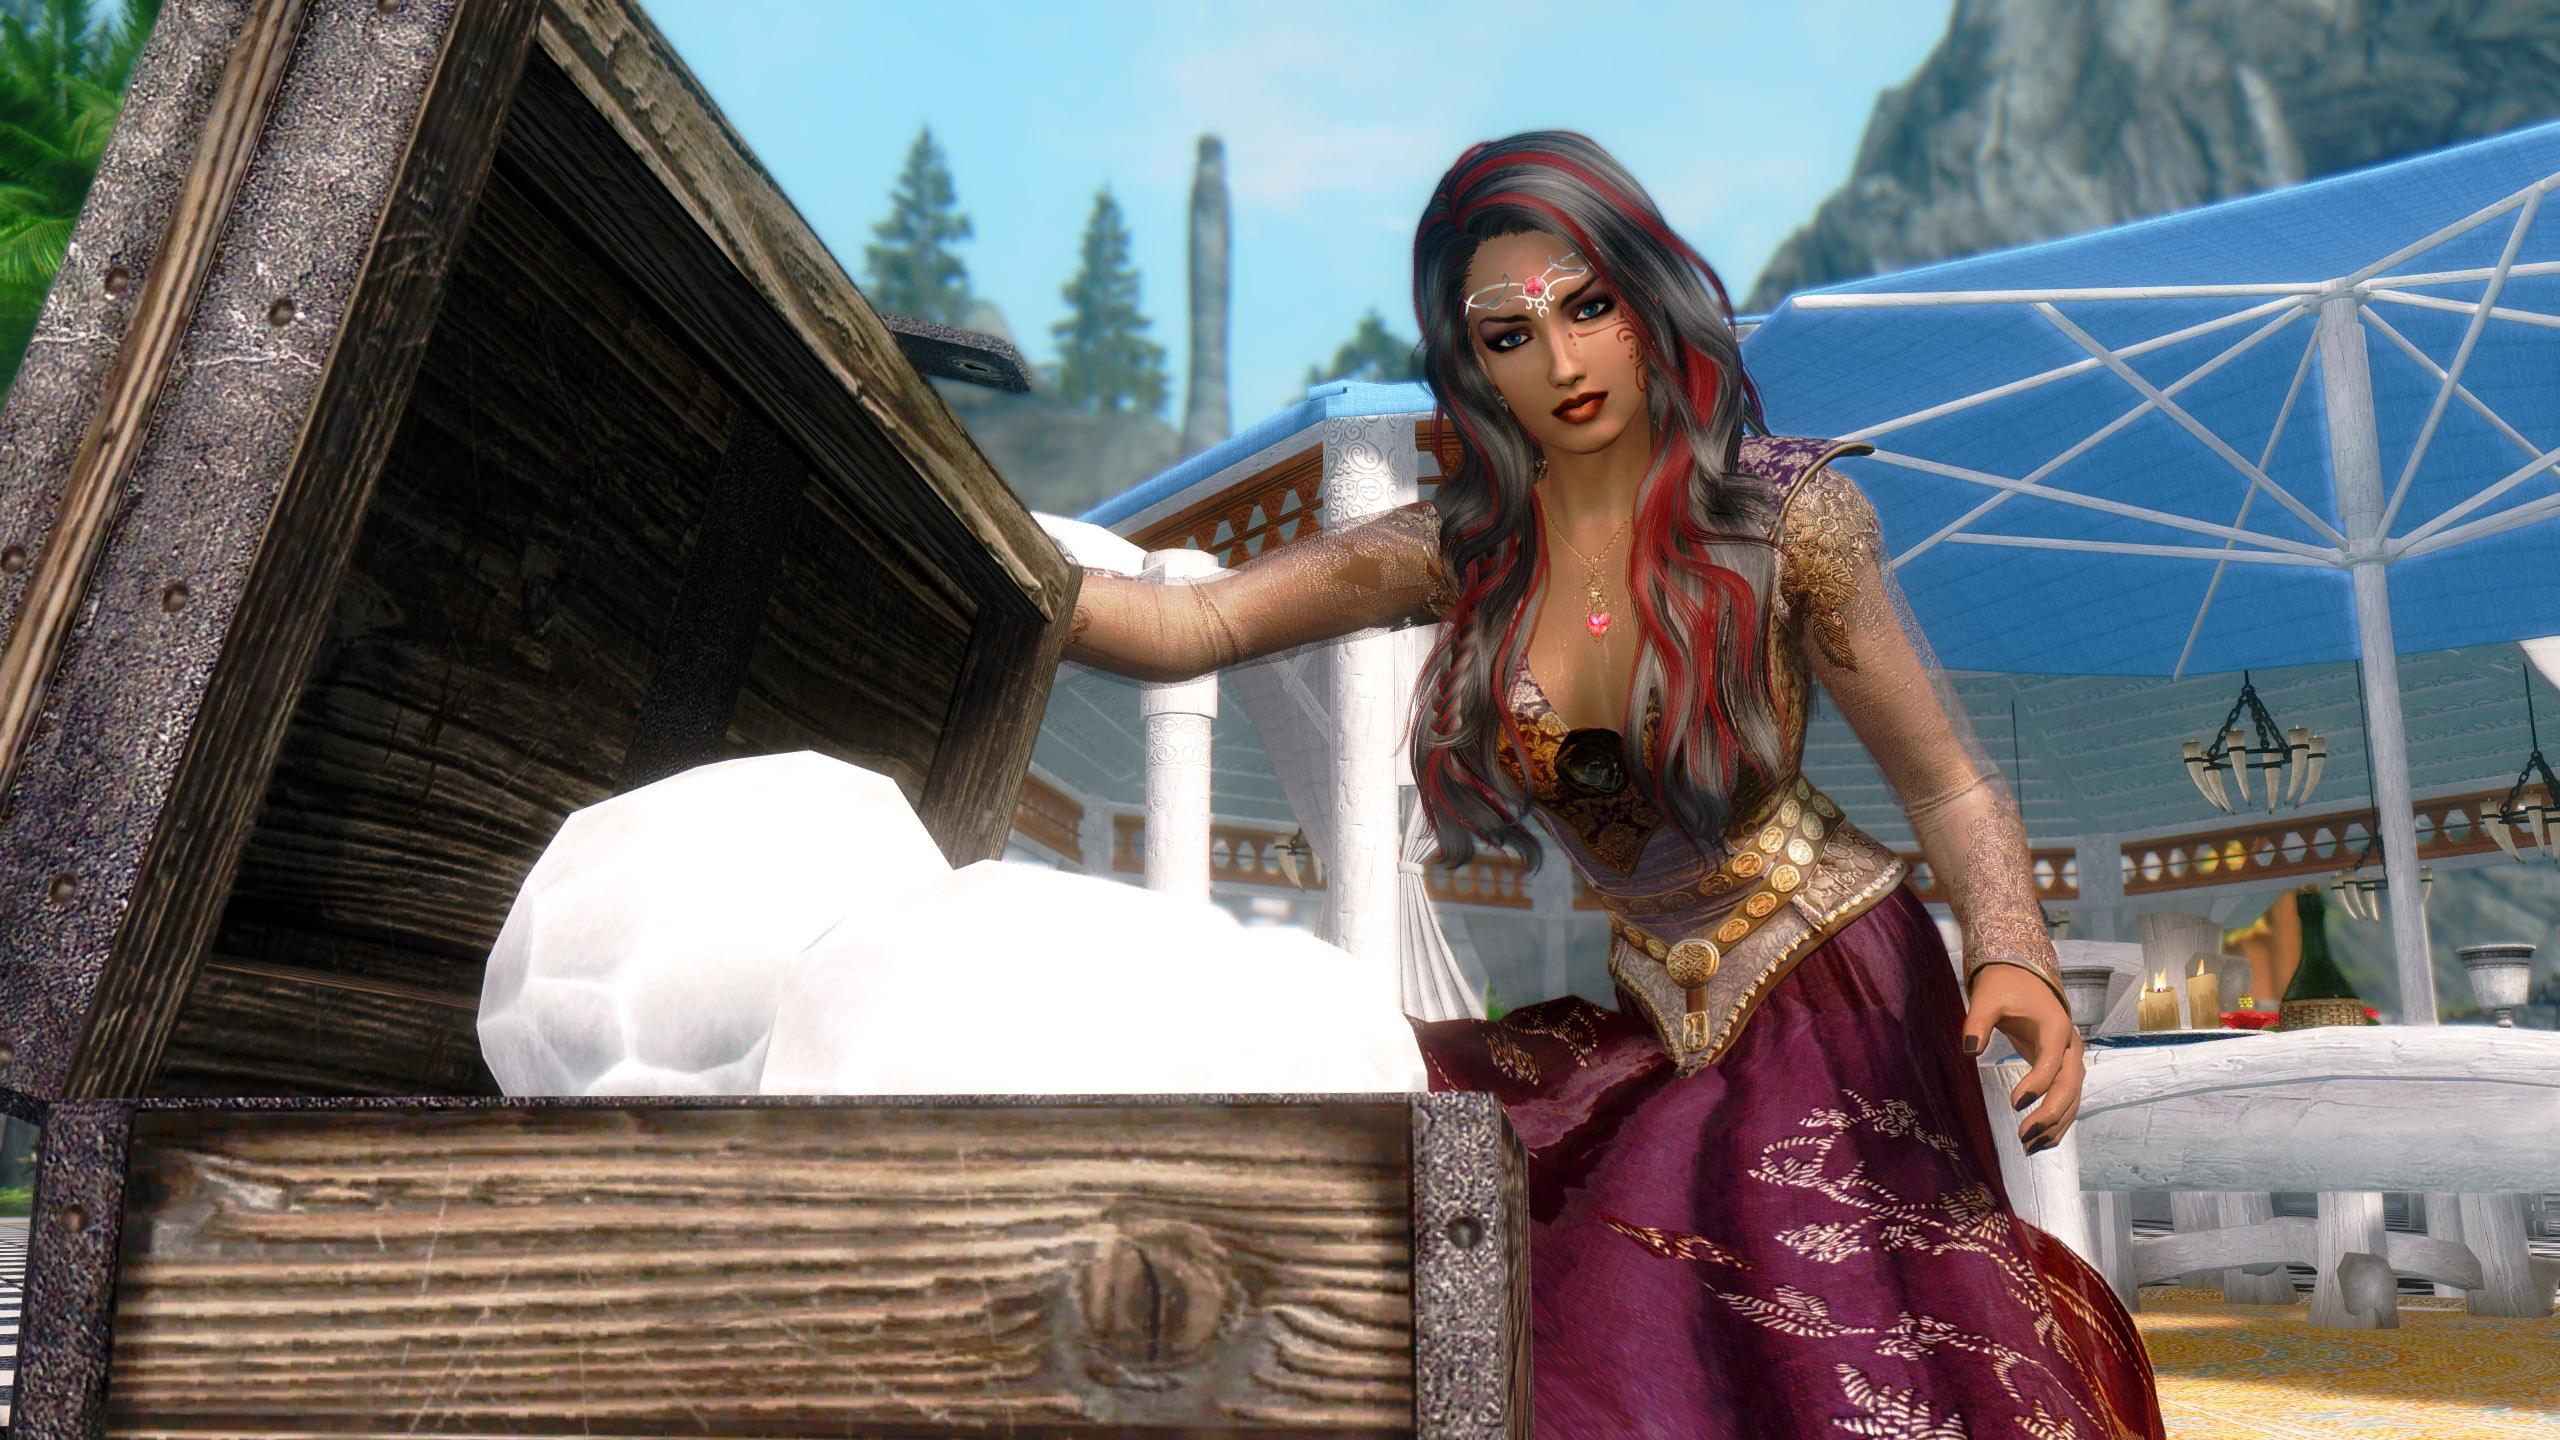 627. Алисса, клад, GP.jpg - Elder Scrolls 5: Skyrim, the CBBE, Сборка-21